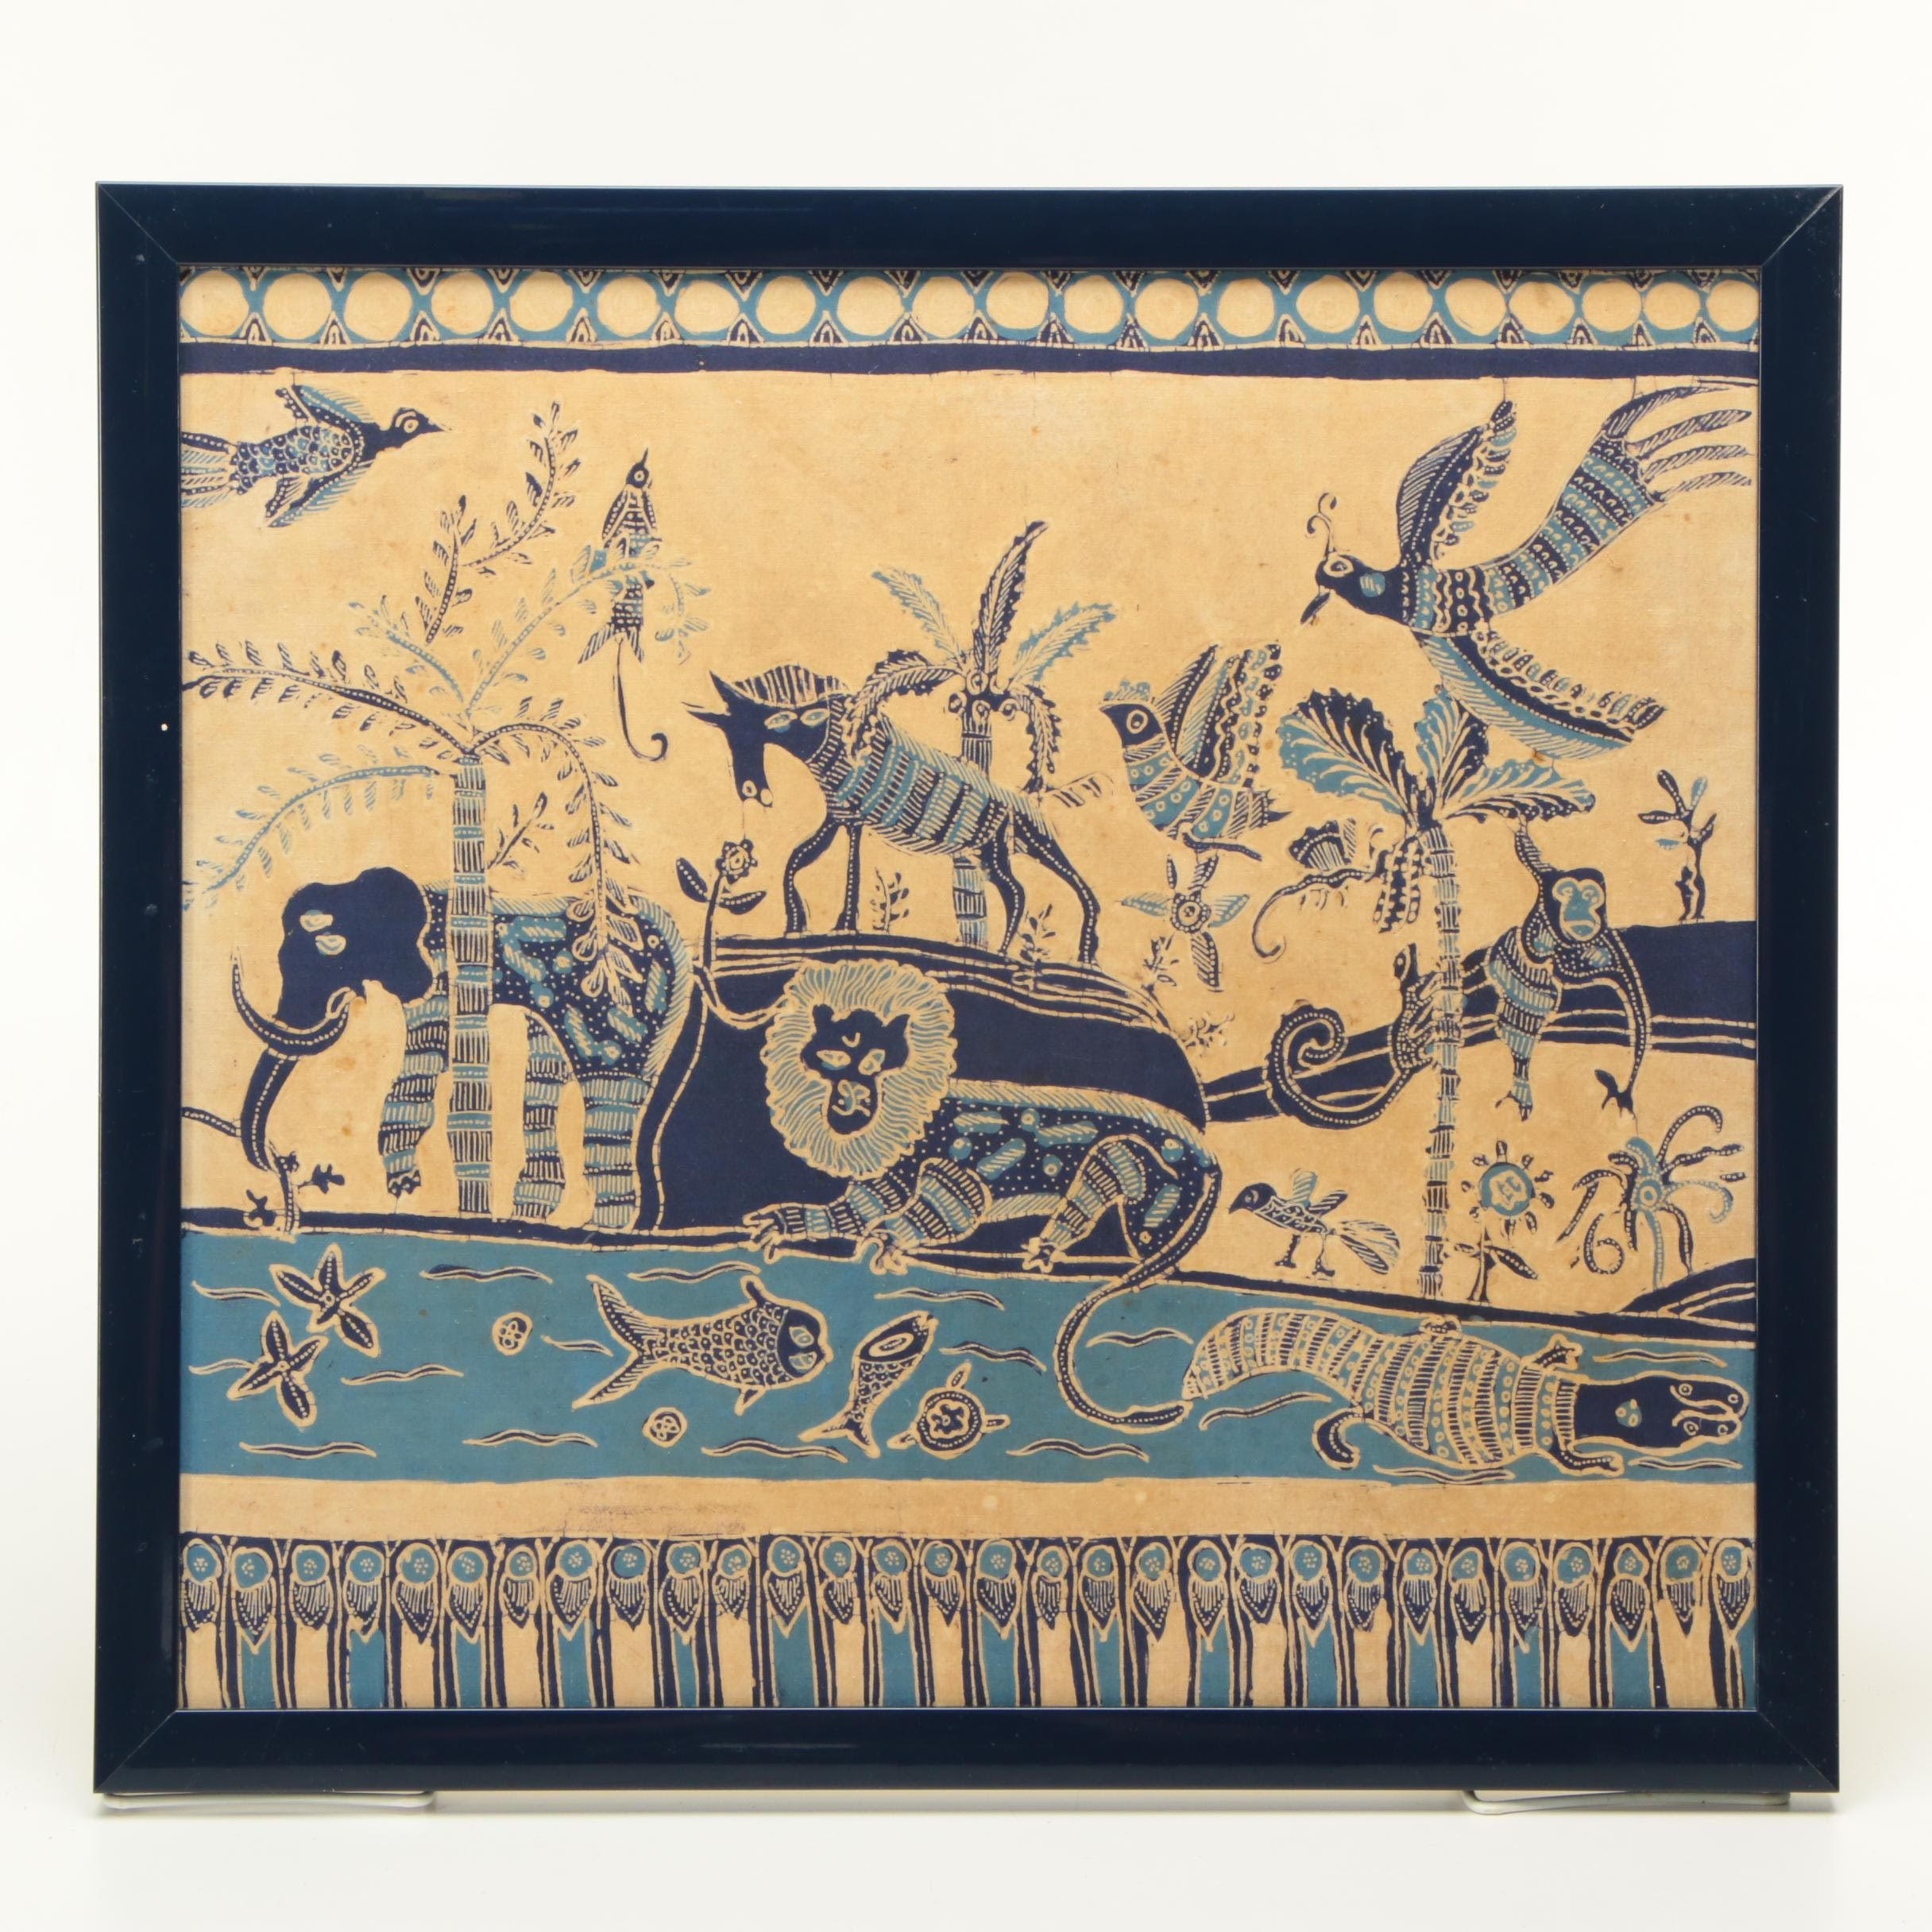 Batik Textile Print of Animals at a Watering Hole